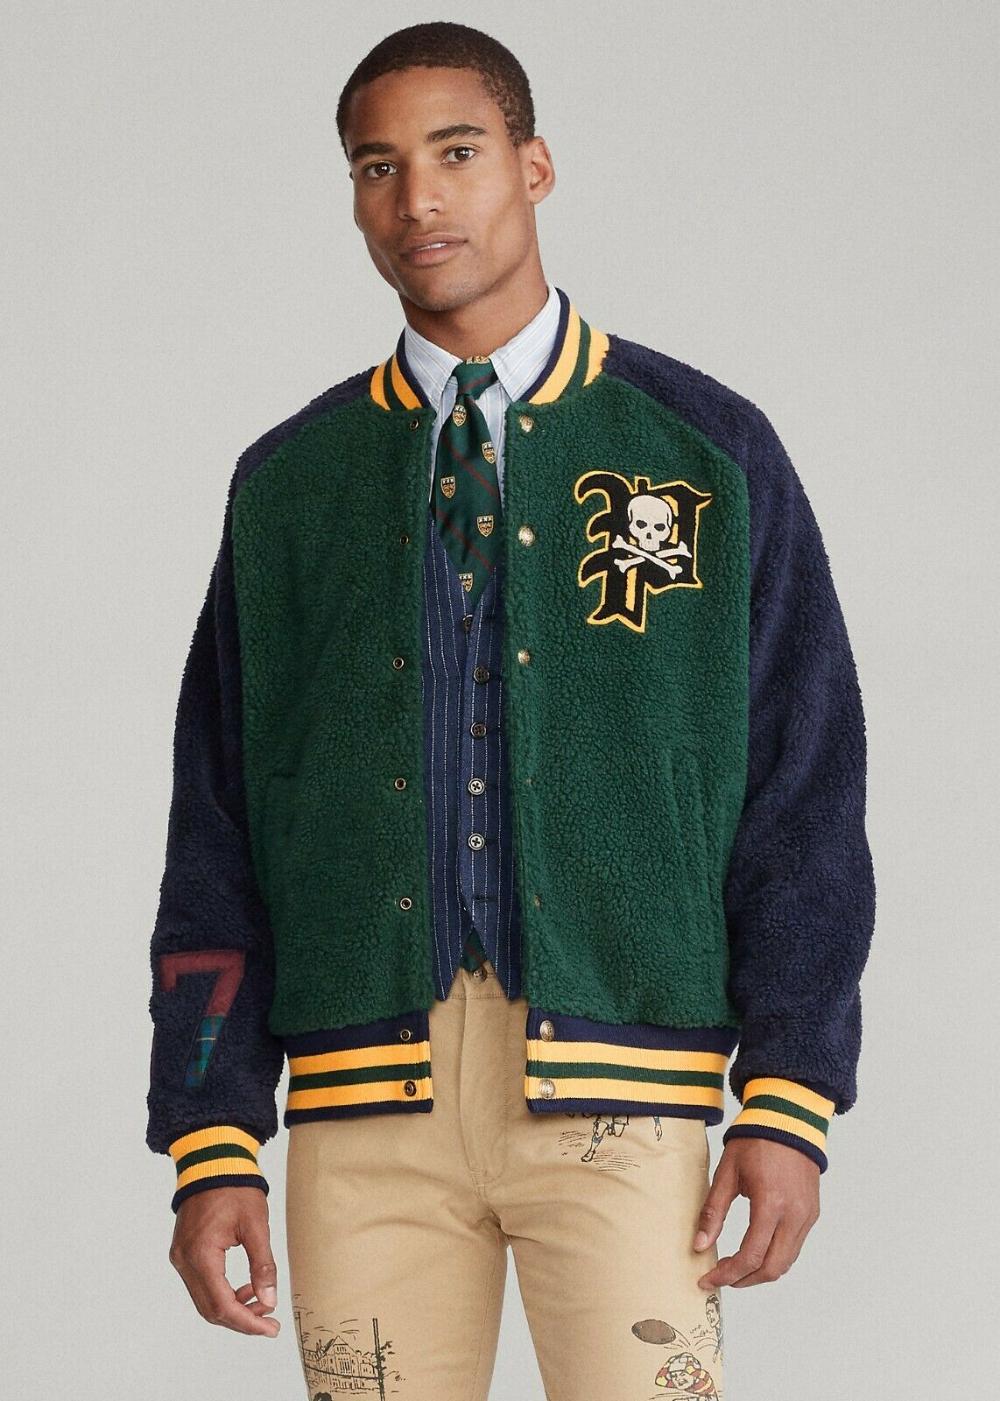 Polo Ralph Lauren Vintage Varsity Letterman Jacket in Navy